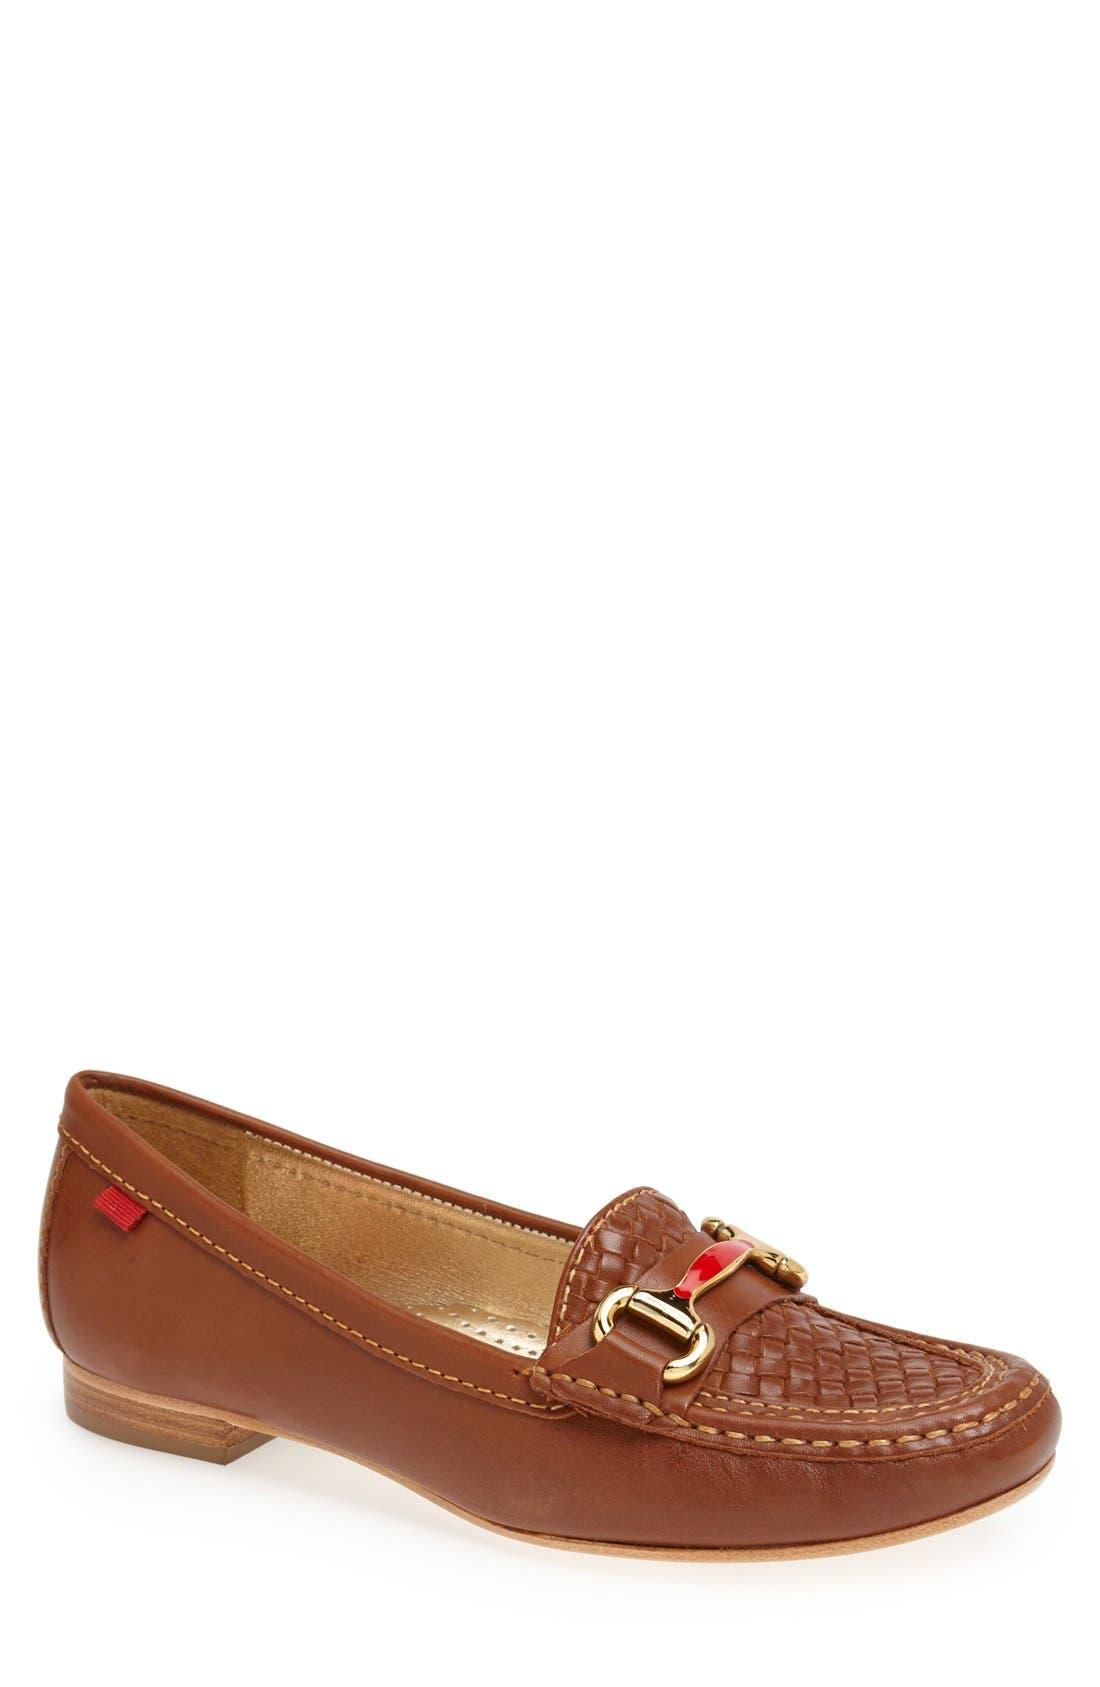 Alternate Image 1 Selected - Marc Joseph New York 'Grand St.' Calfskin Leather Loafer